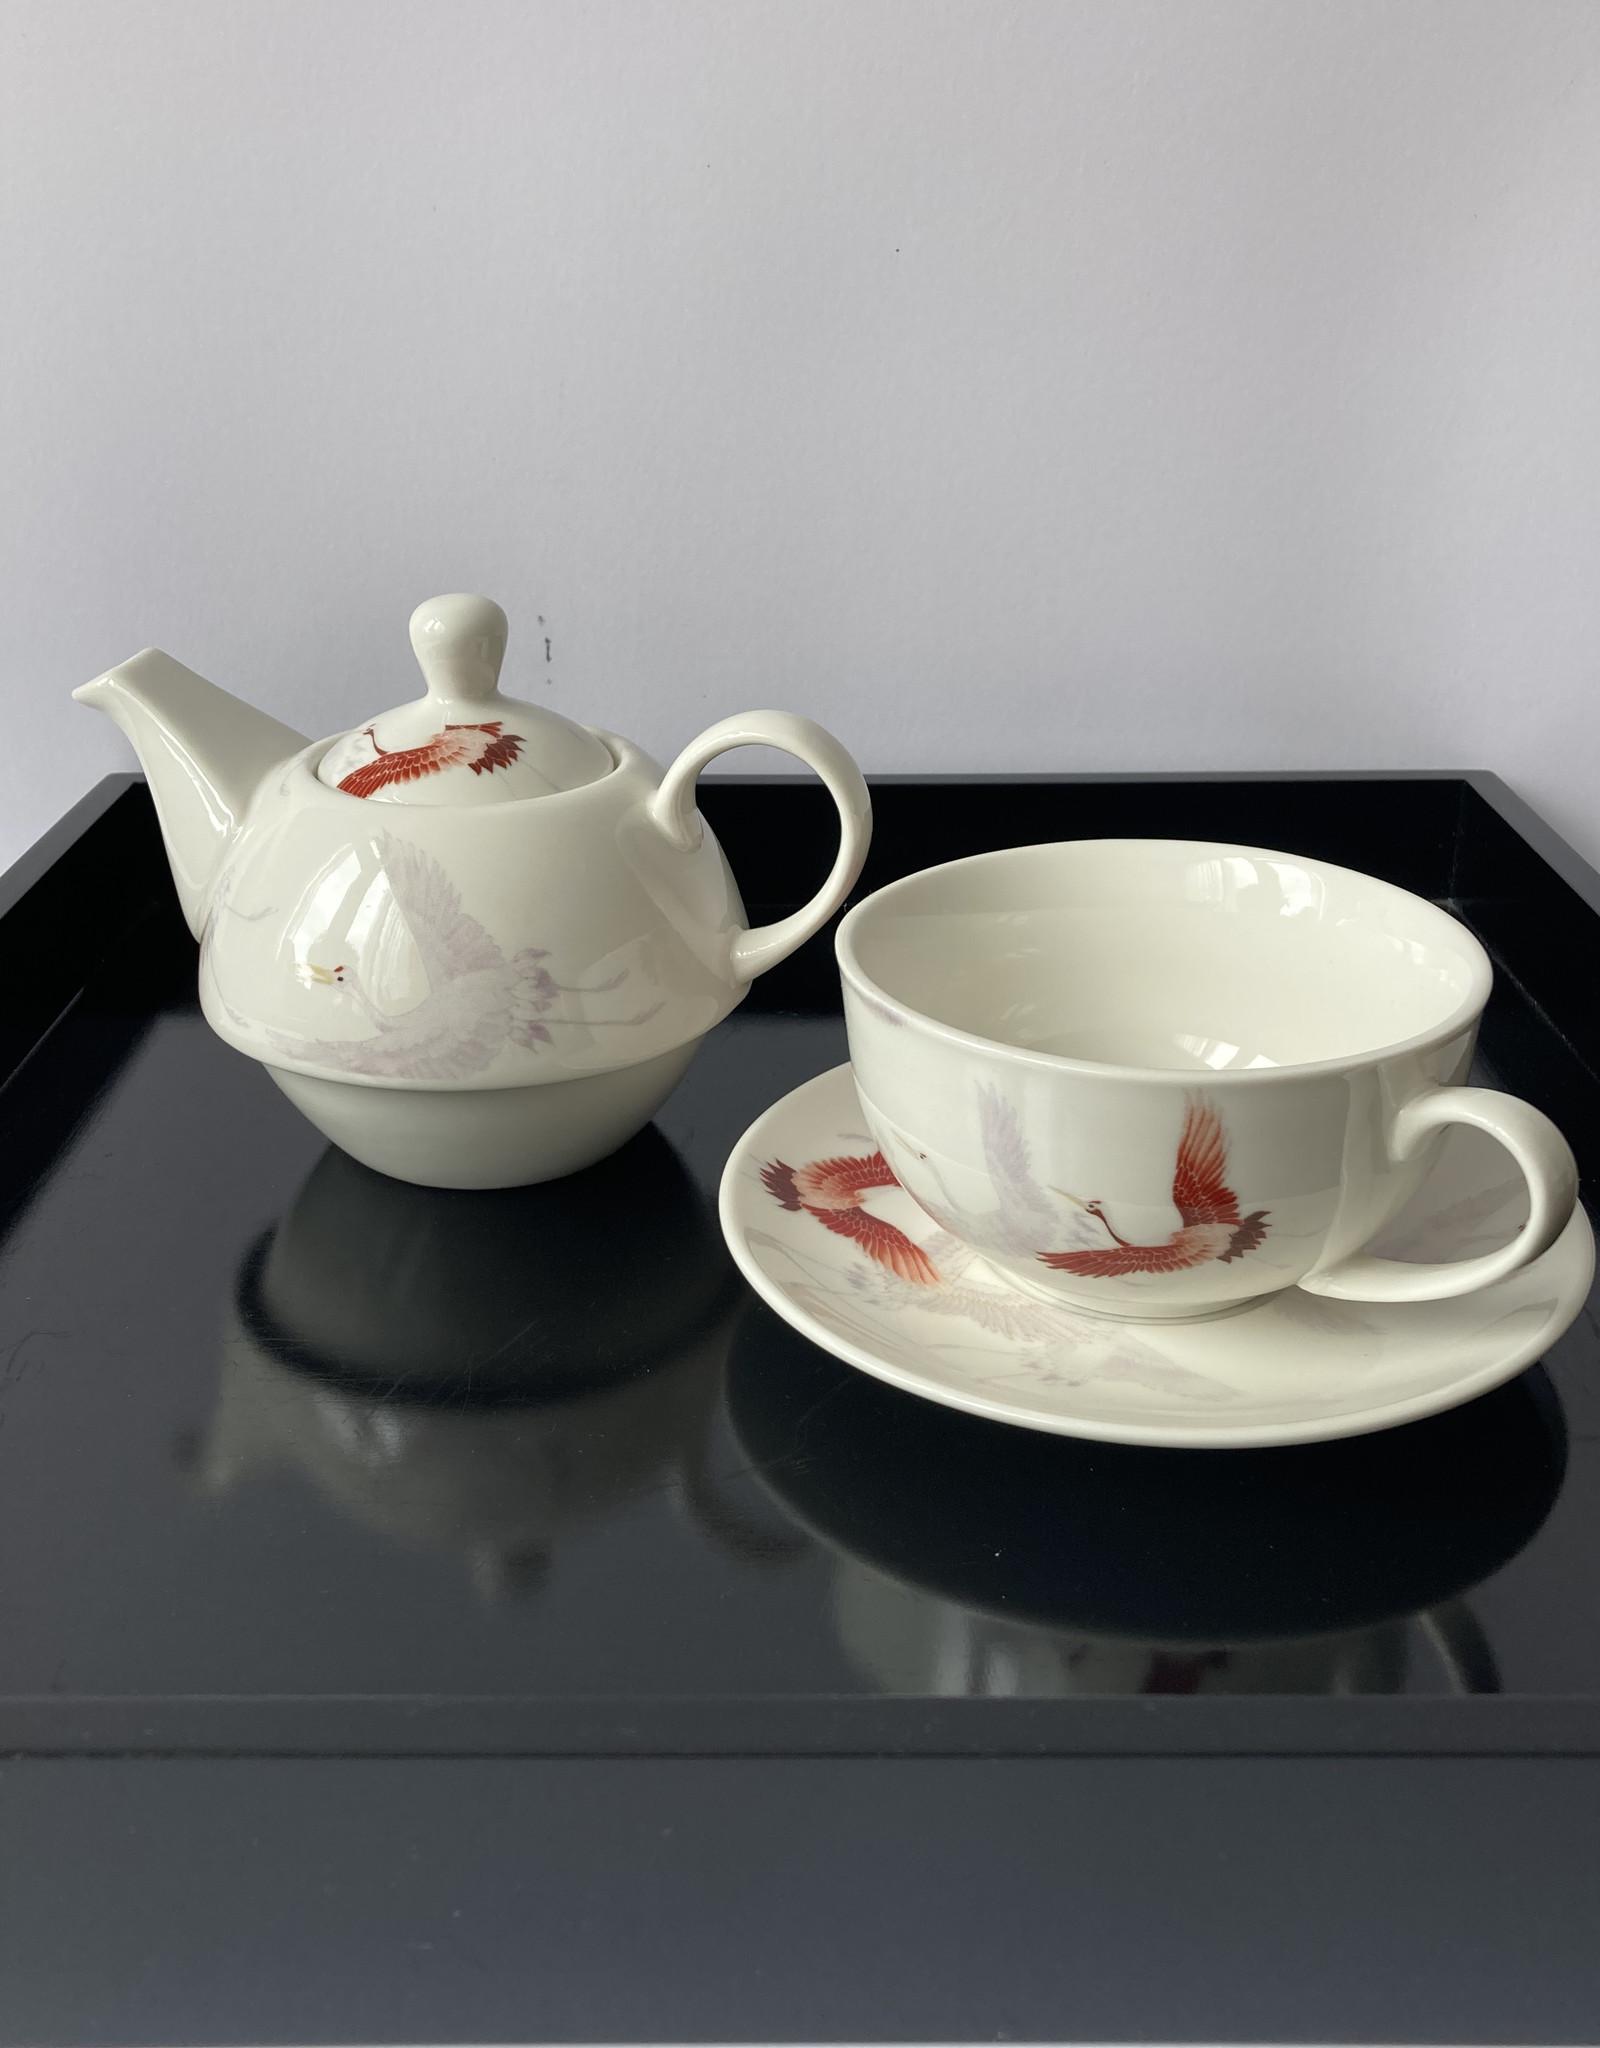 Royal tea Roylal Tea Tea for one theeset kraanvogel